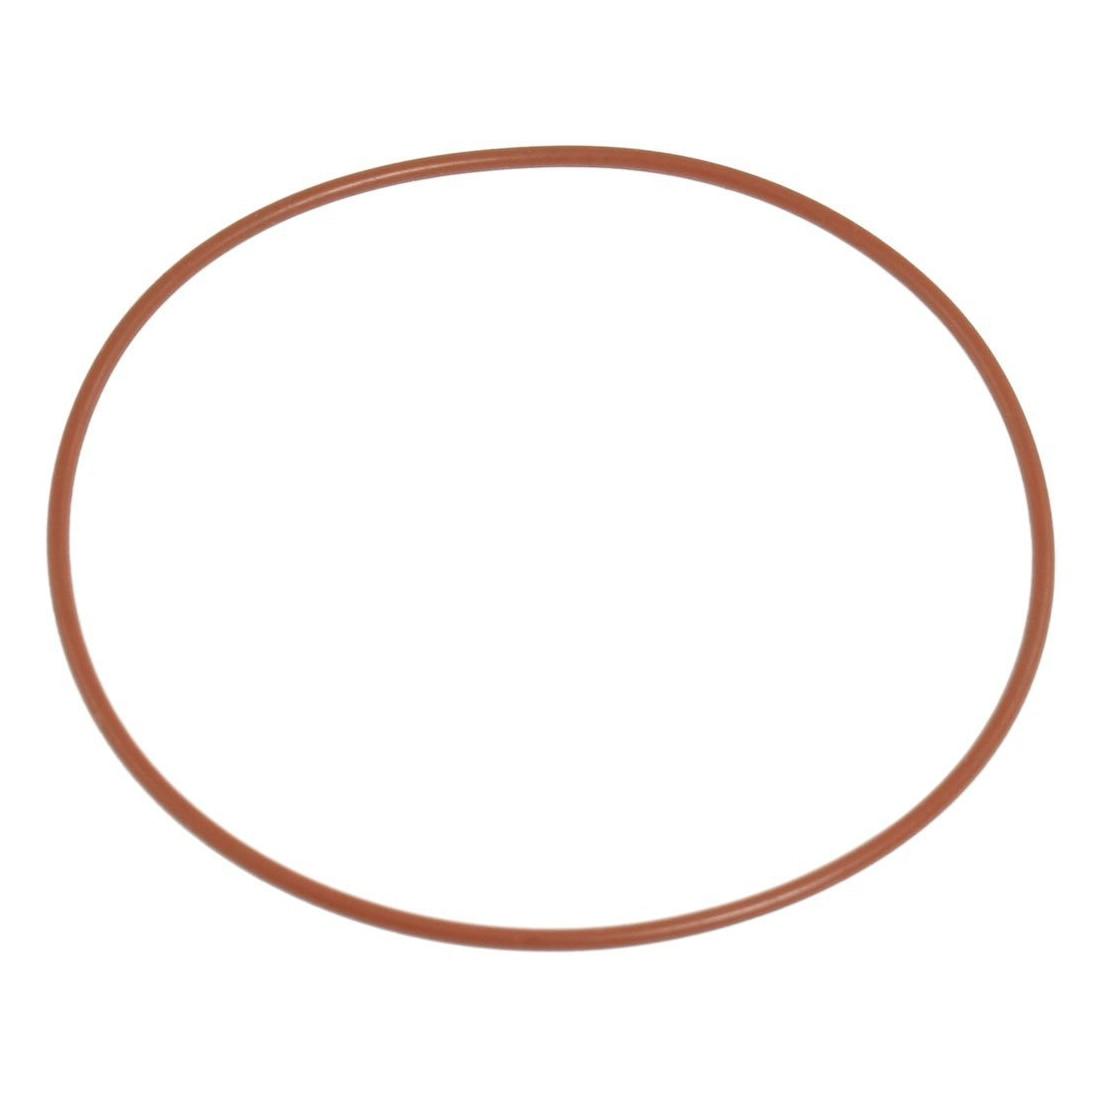 Arandela de sellado de silicona caliente O anillo rojo 85mm x 81mm x 2mm